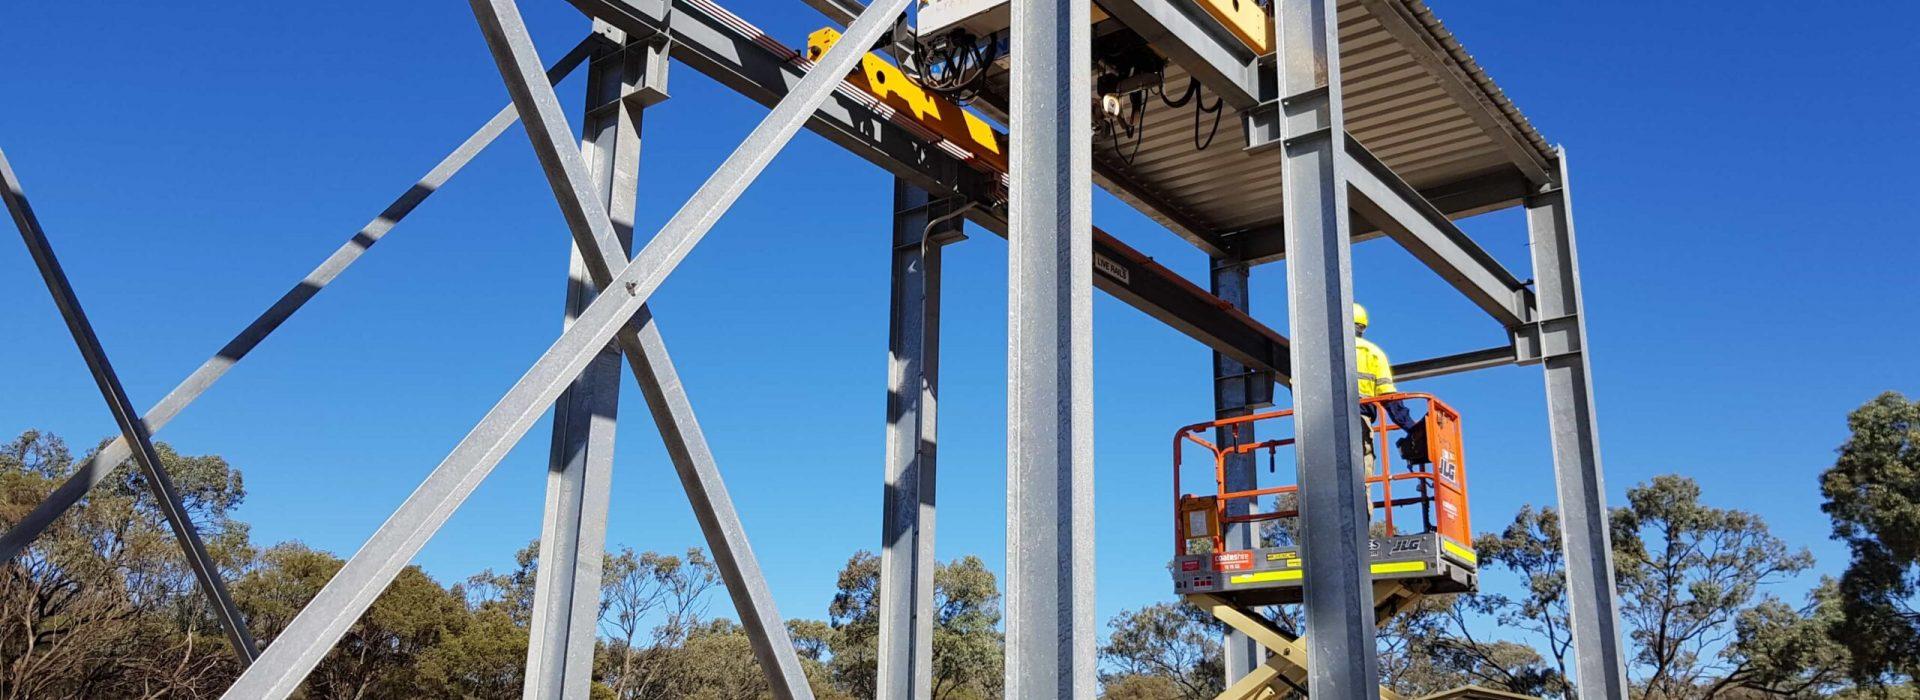 Crane & Lifting Equipment Service